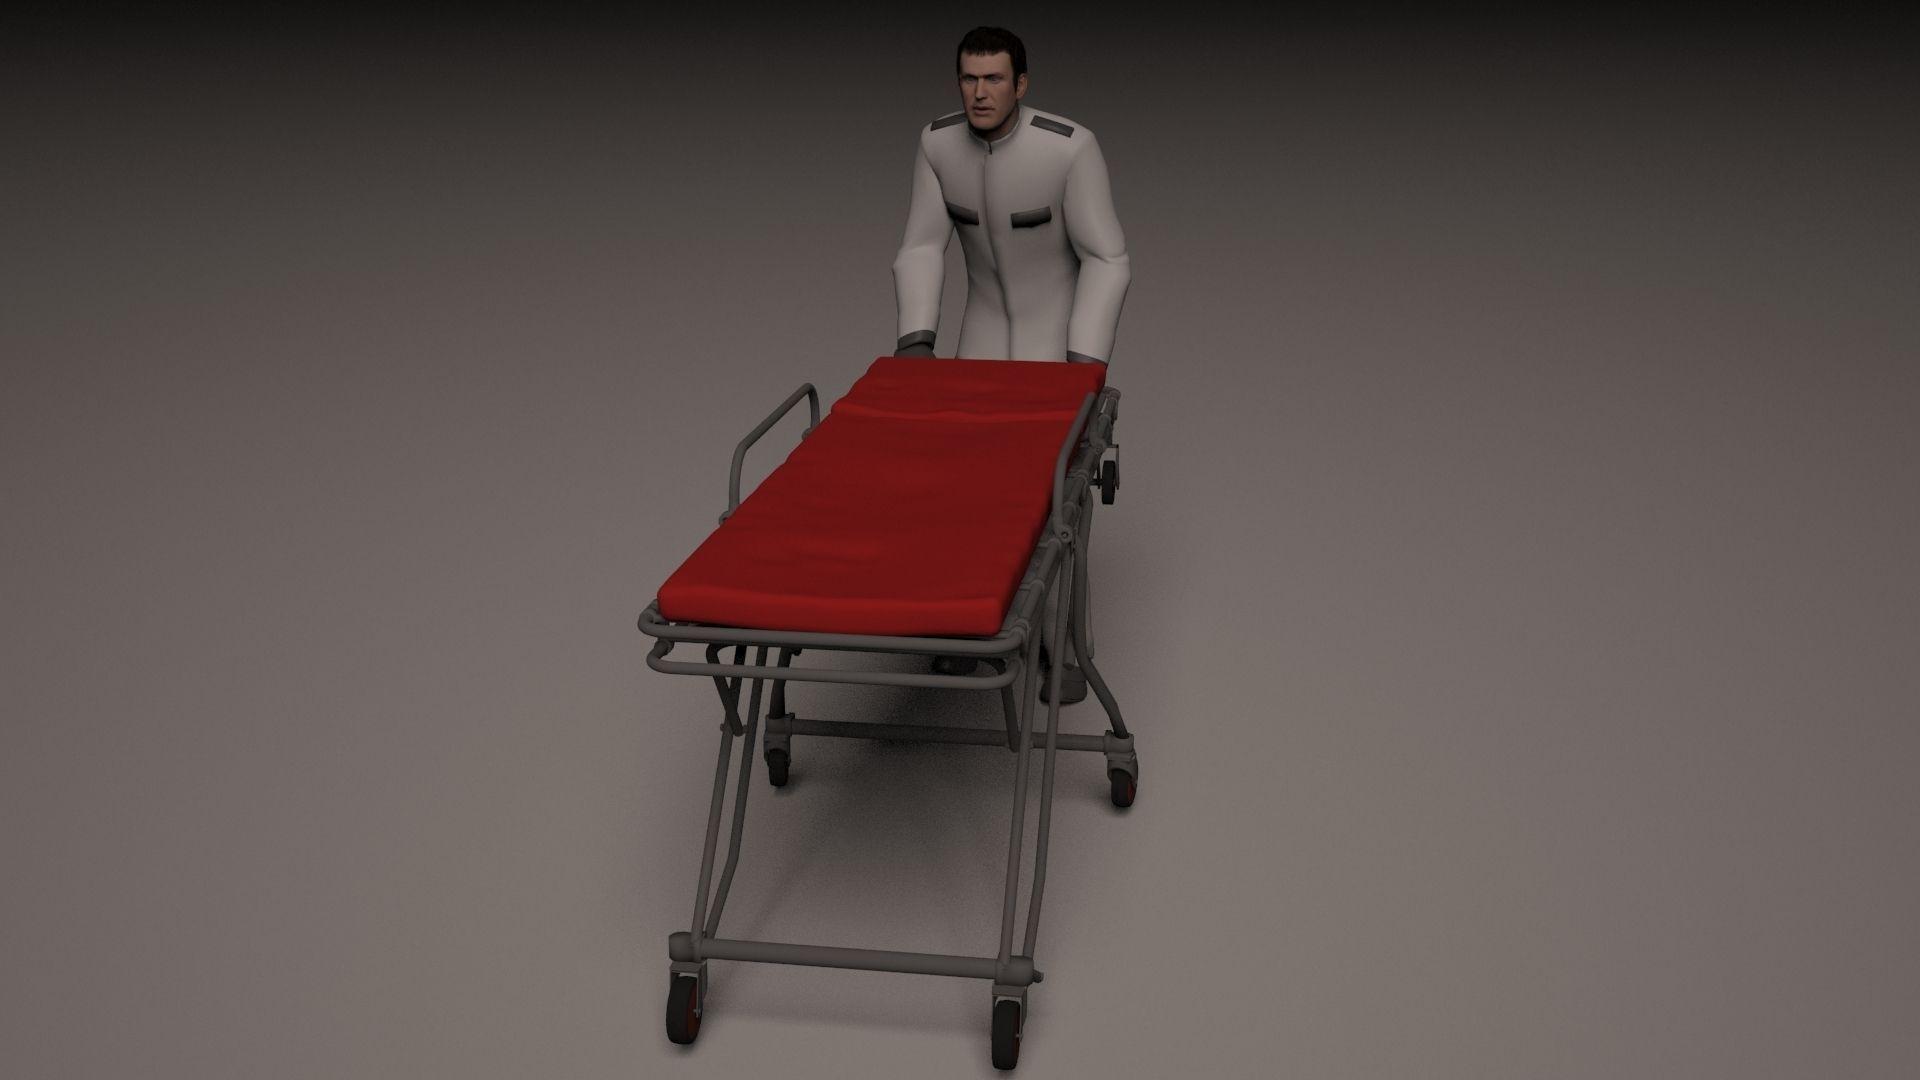 Hospital orderly pushing stretcher